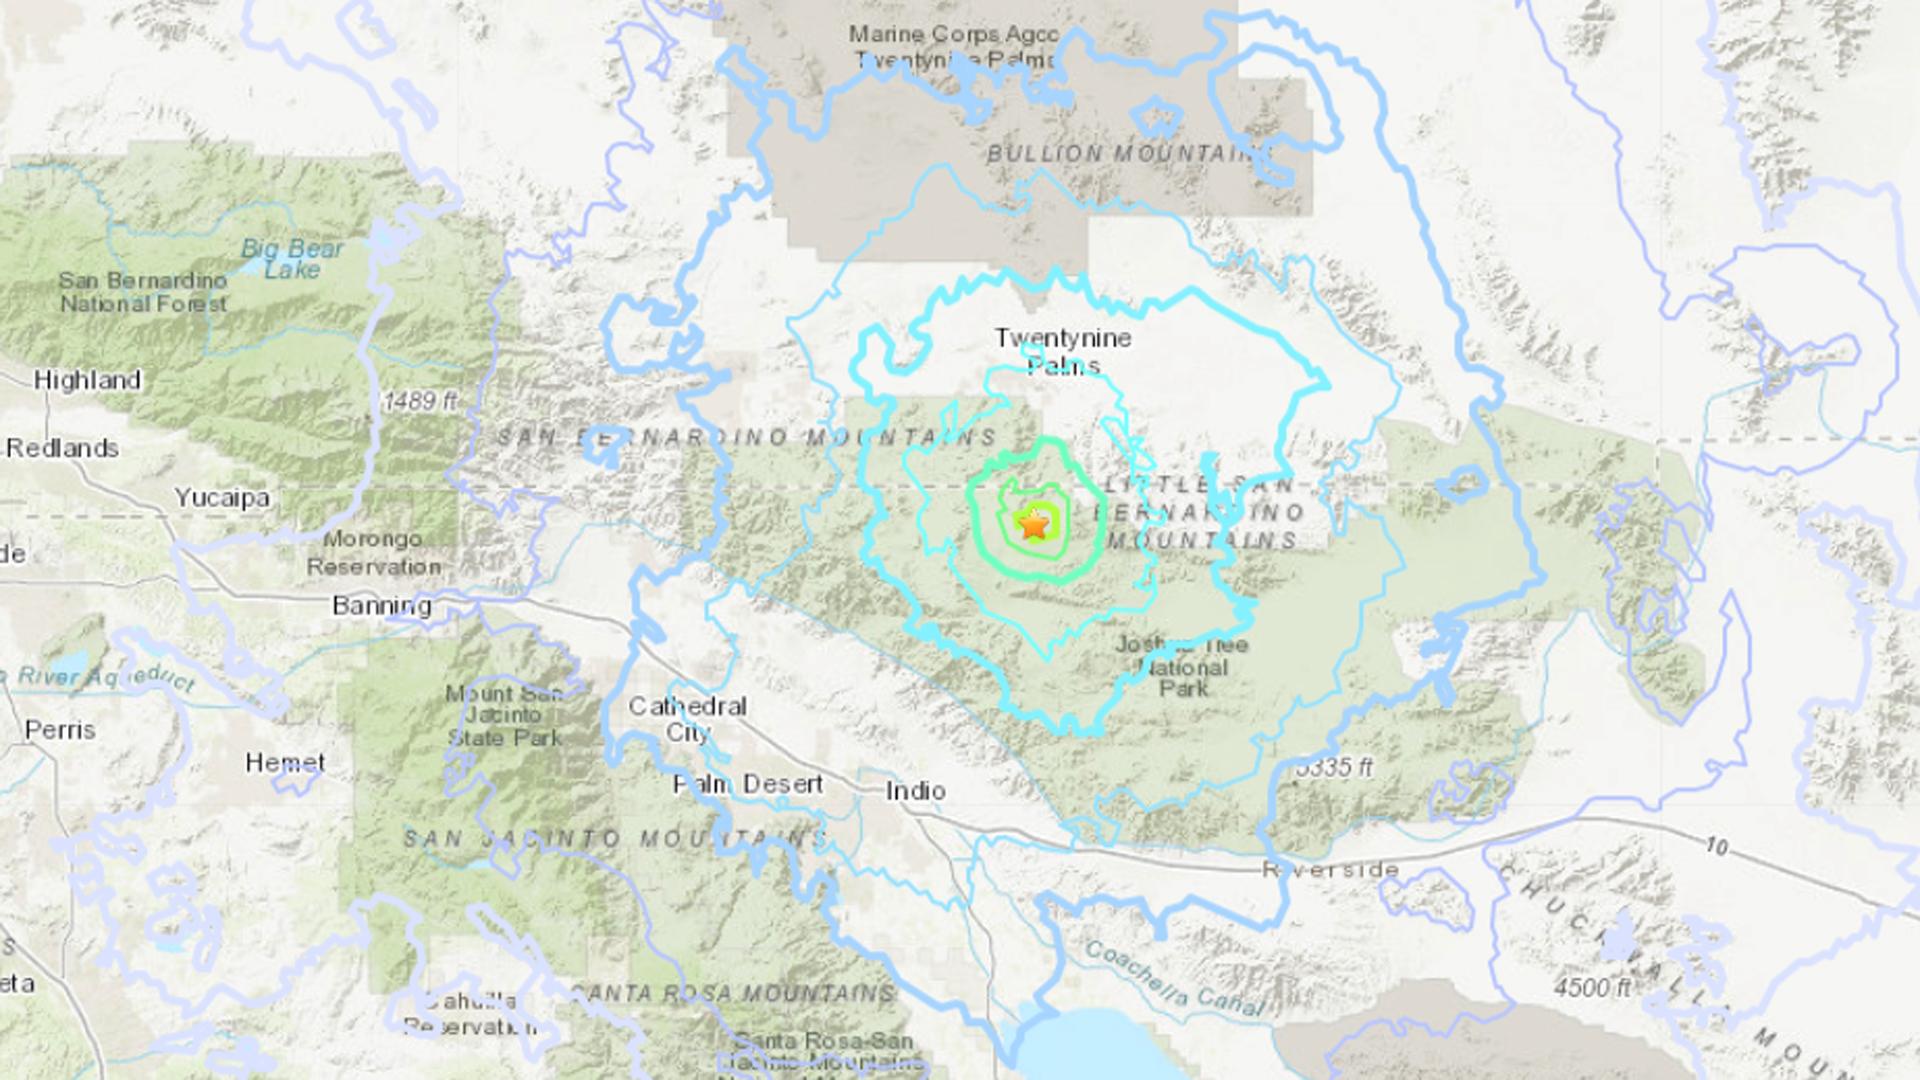 A 4.2 quake centered near Twentynine Palms hit on July 22, 2019. (Credit: USGS)